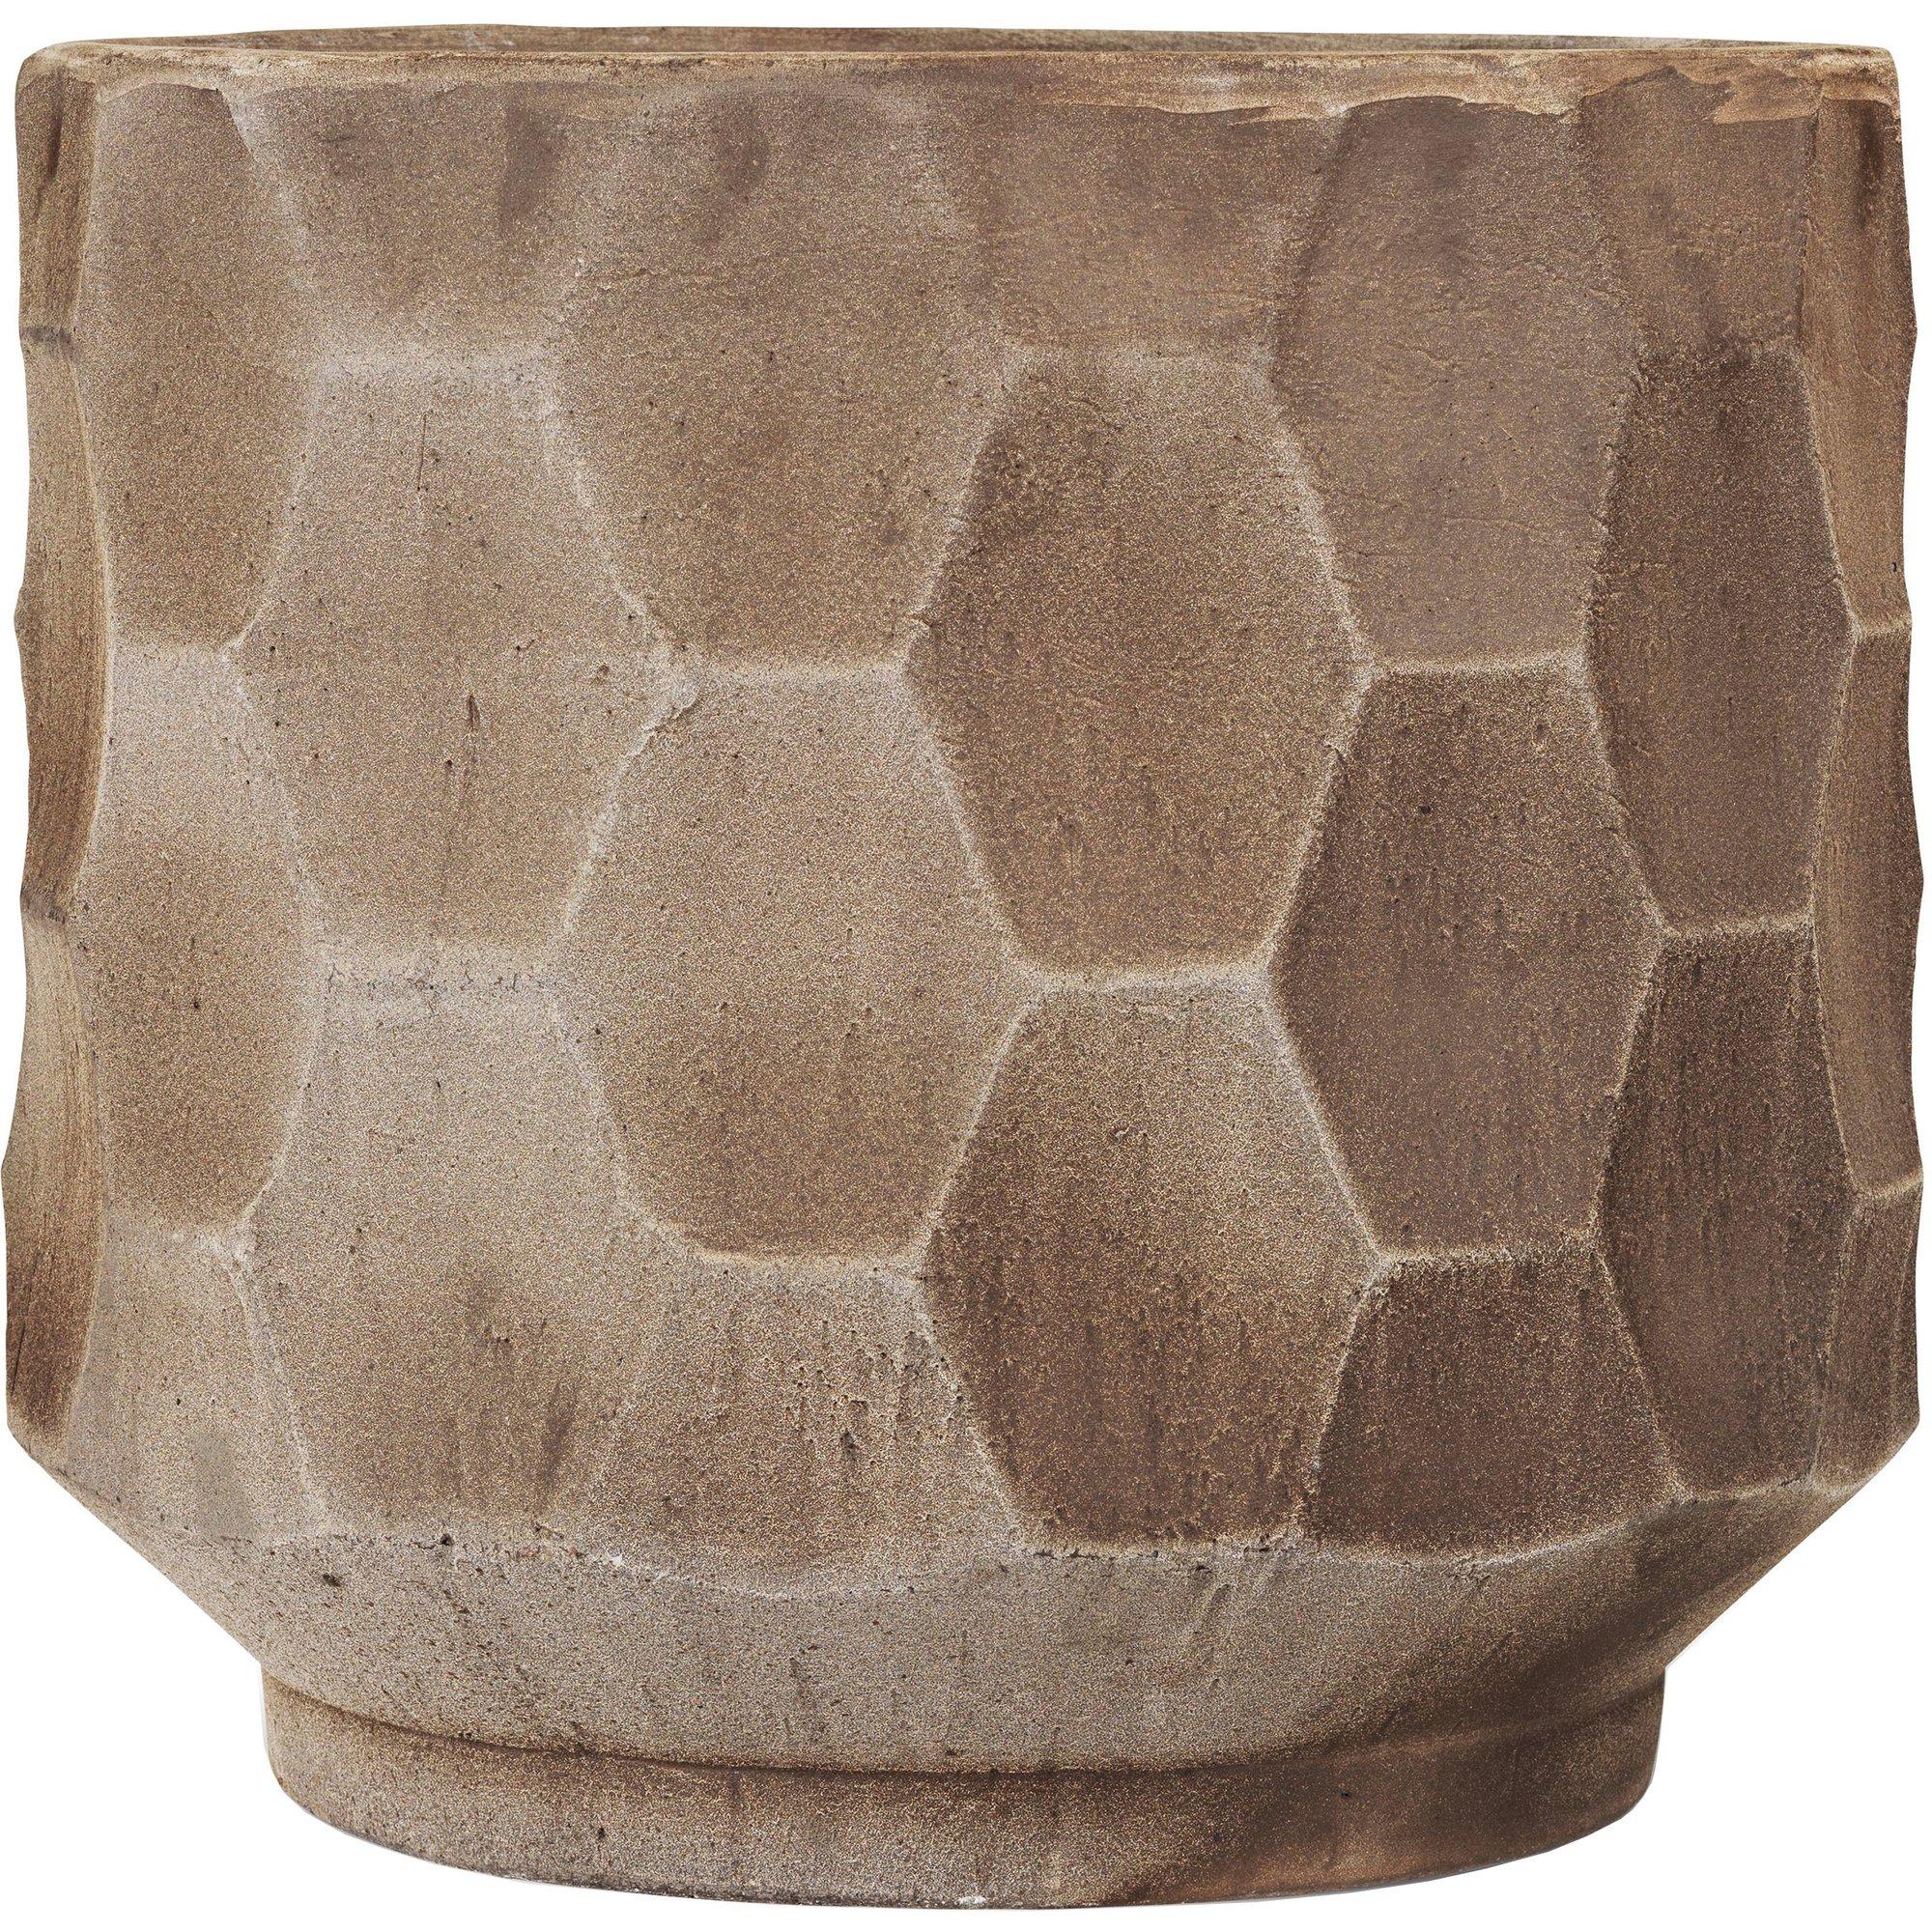 Kähler Gro kruka med fat Ø 43 cm Ljus sand